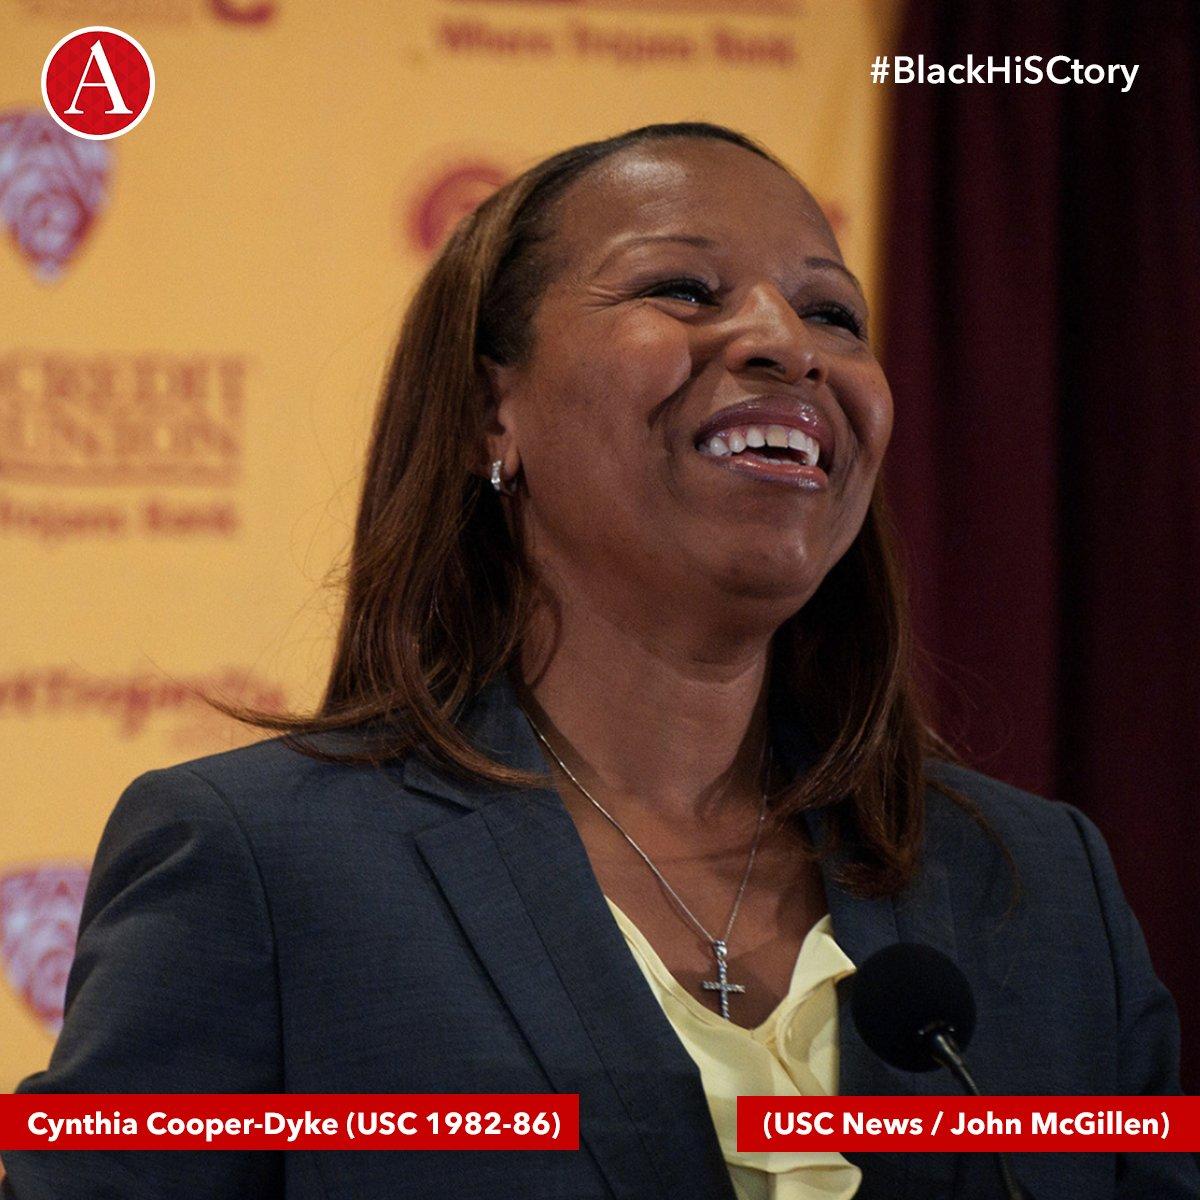 Watch Cynthia Cooper-Dyke, Olympic champion video